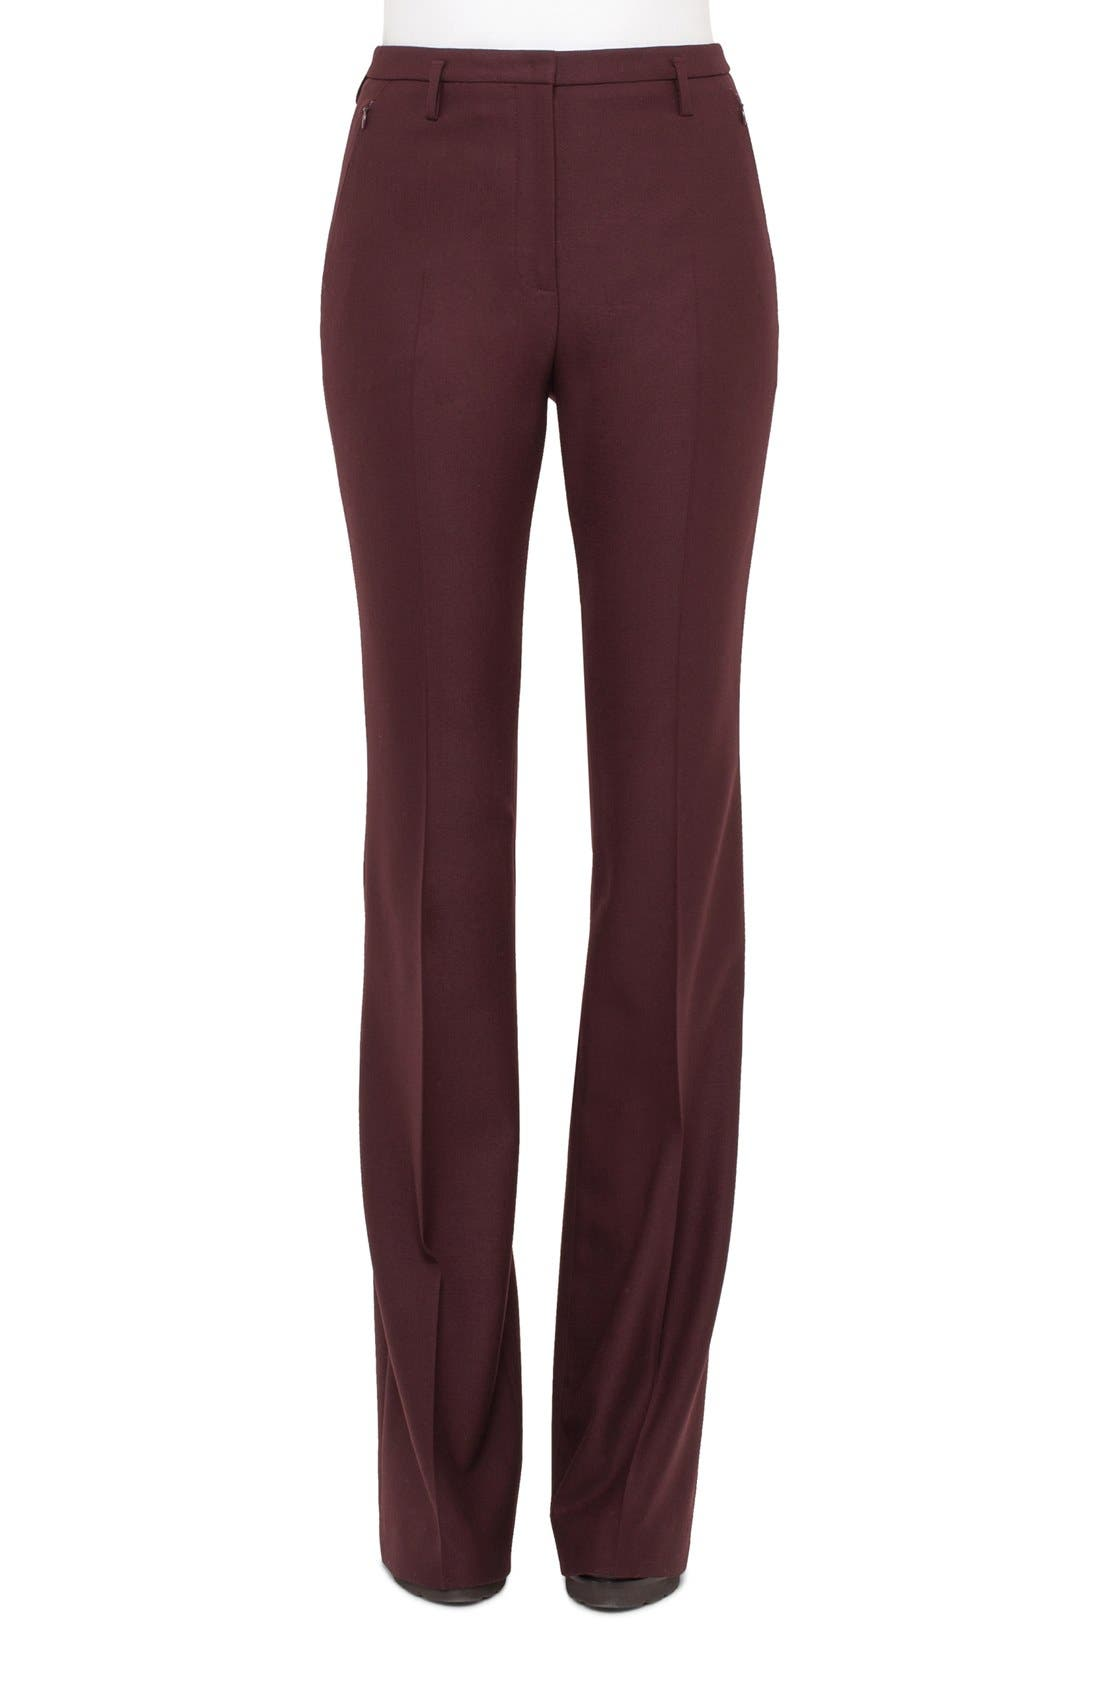 Main Image - Akris 'Fairytale' Stretch Wool Flannel Pants